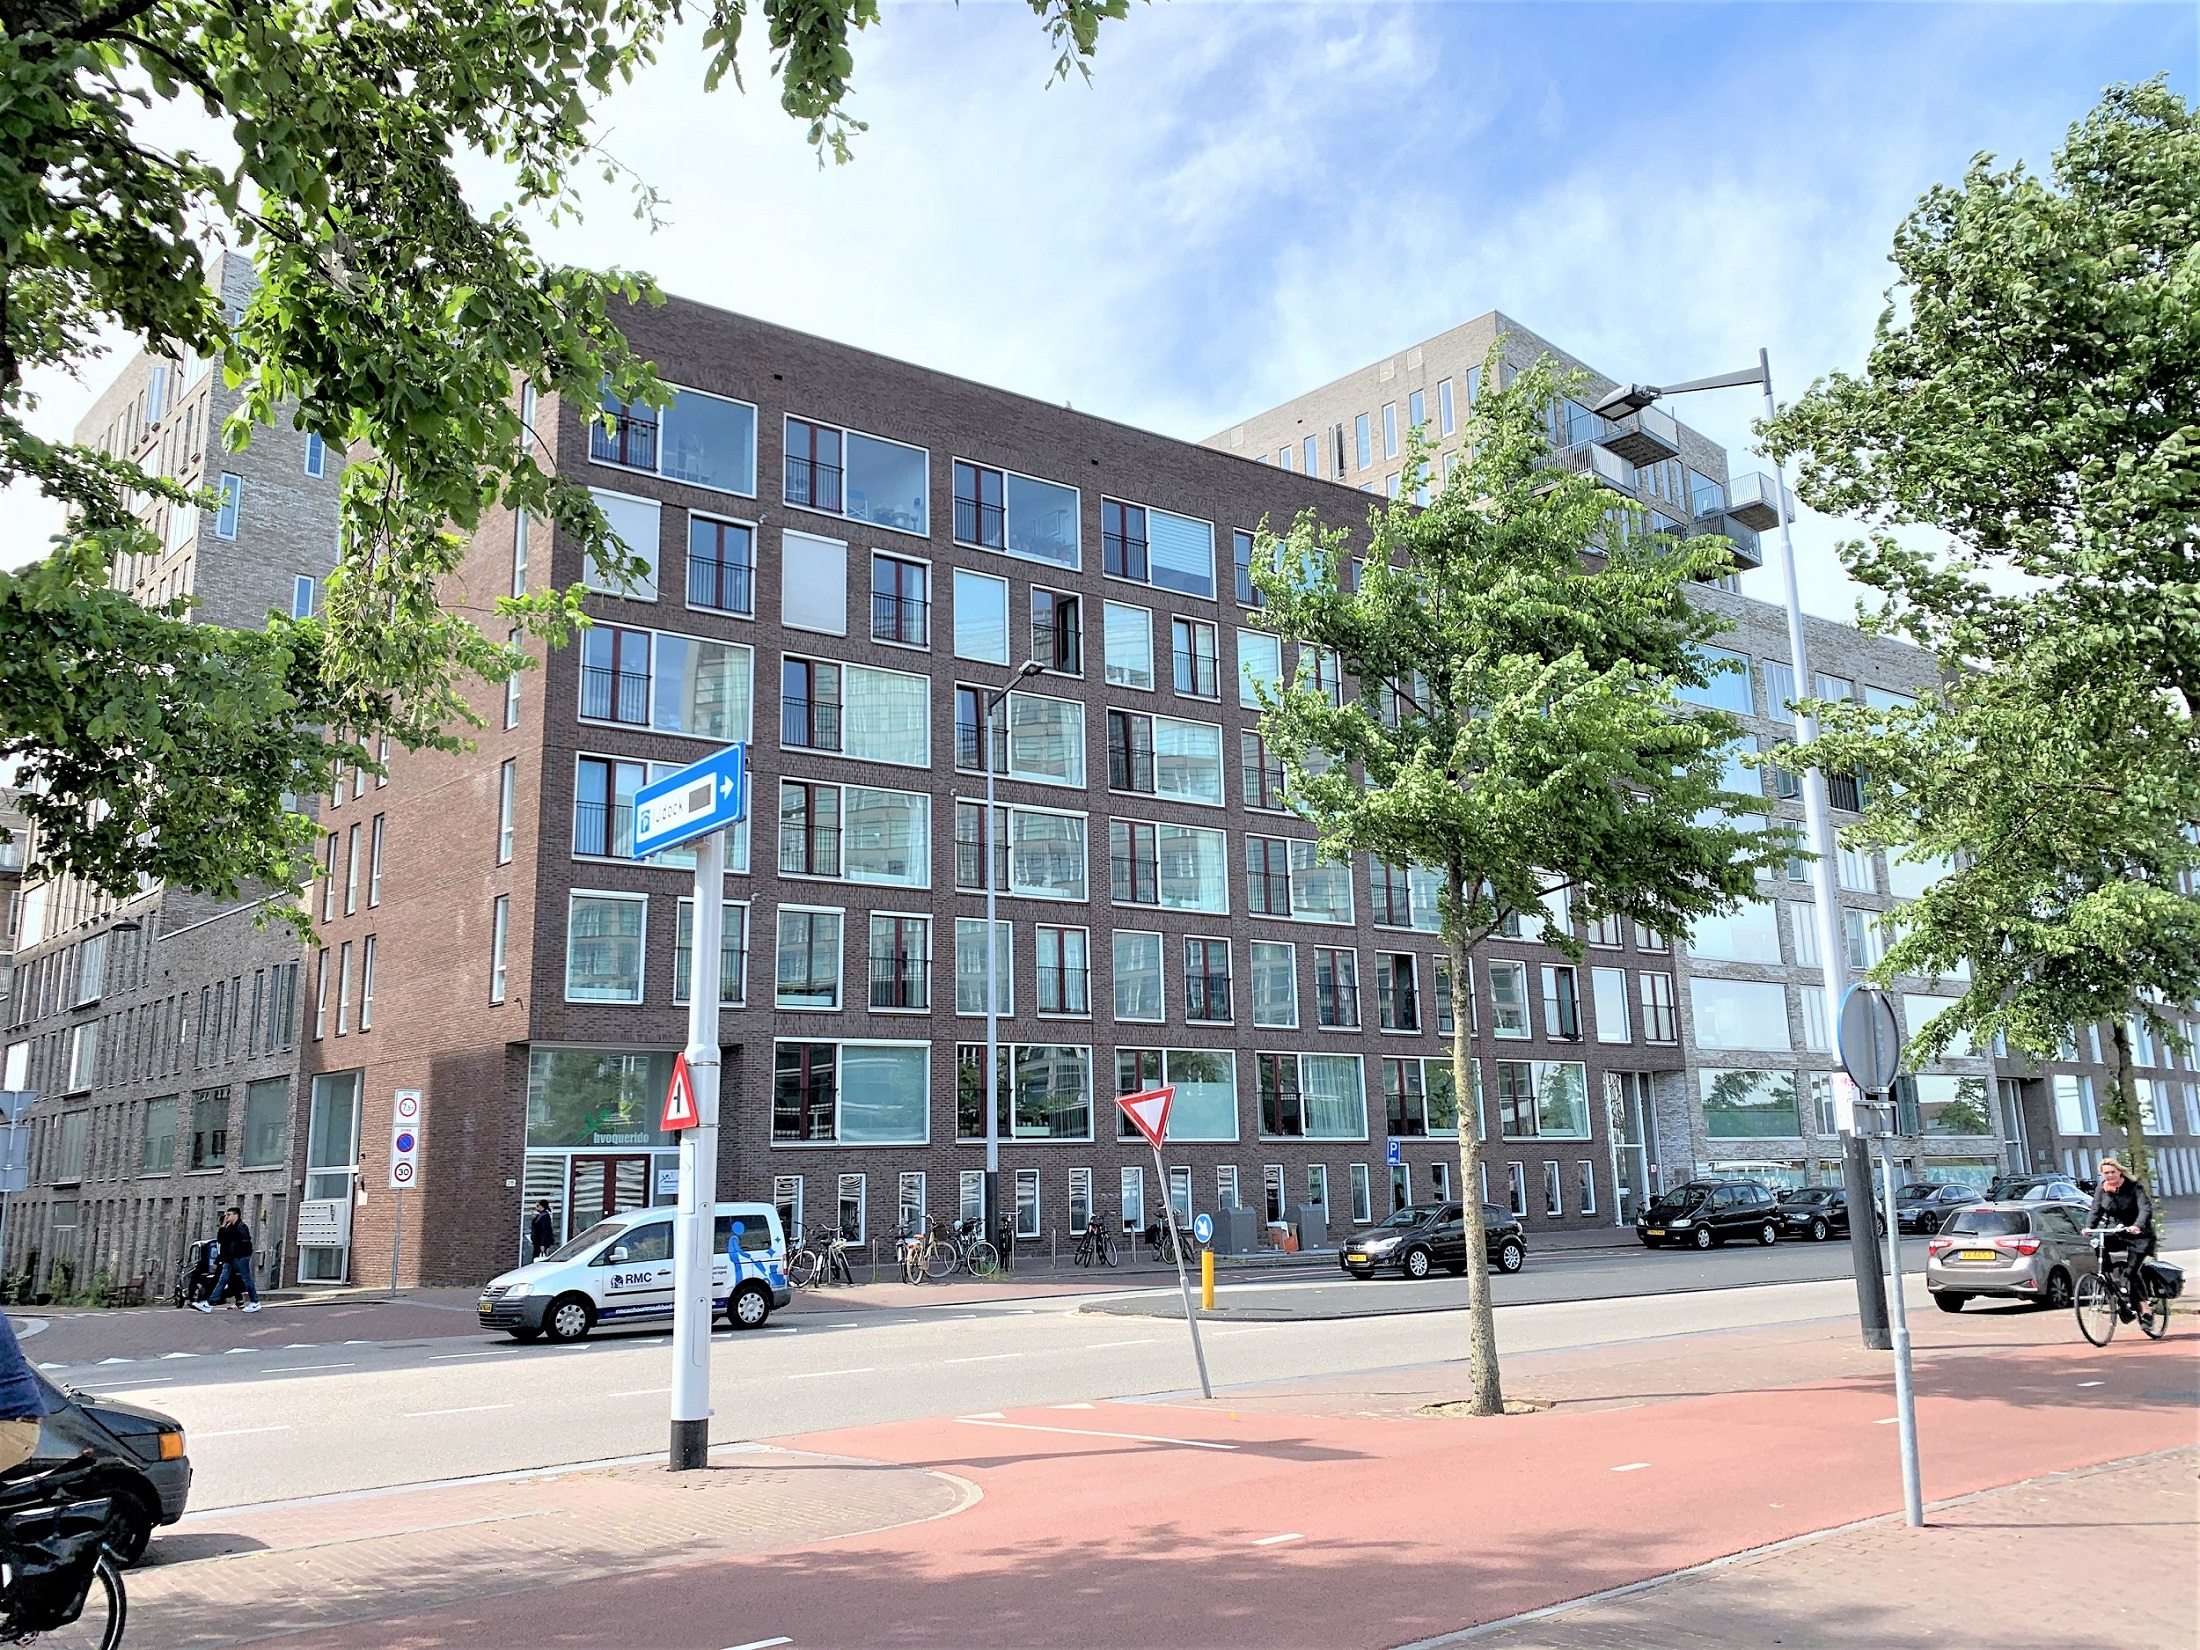 Winthonstraat, Amsterdam